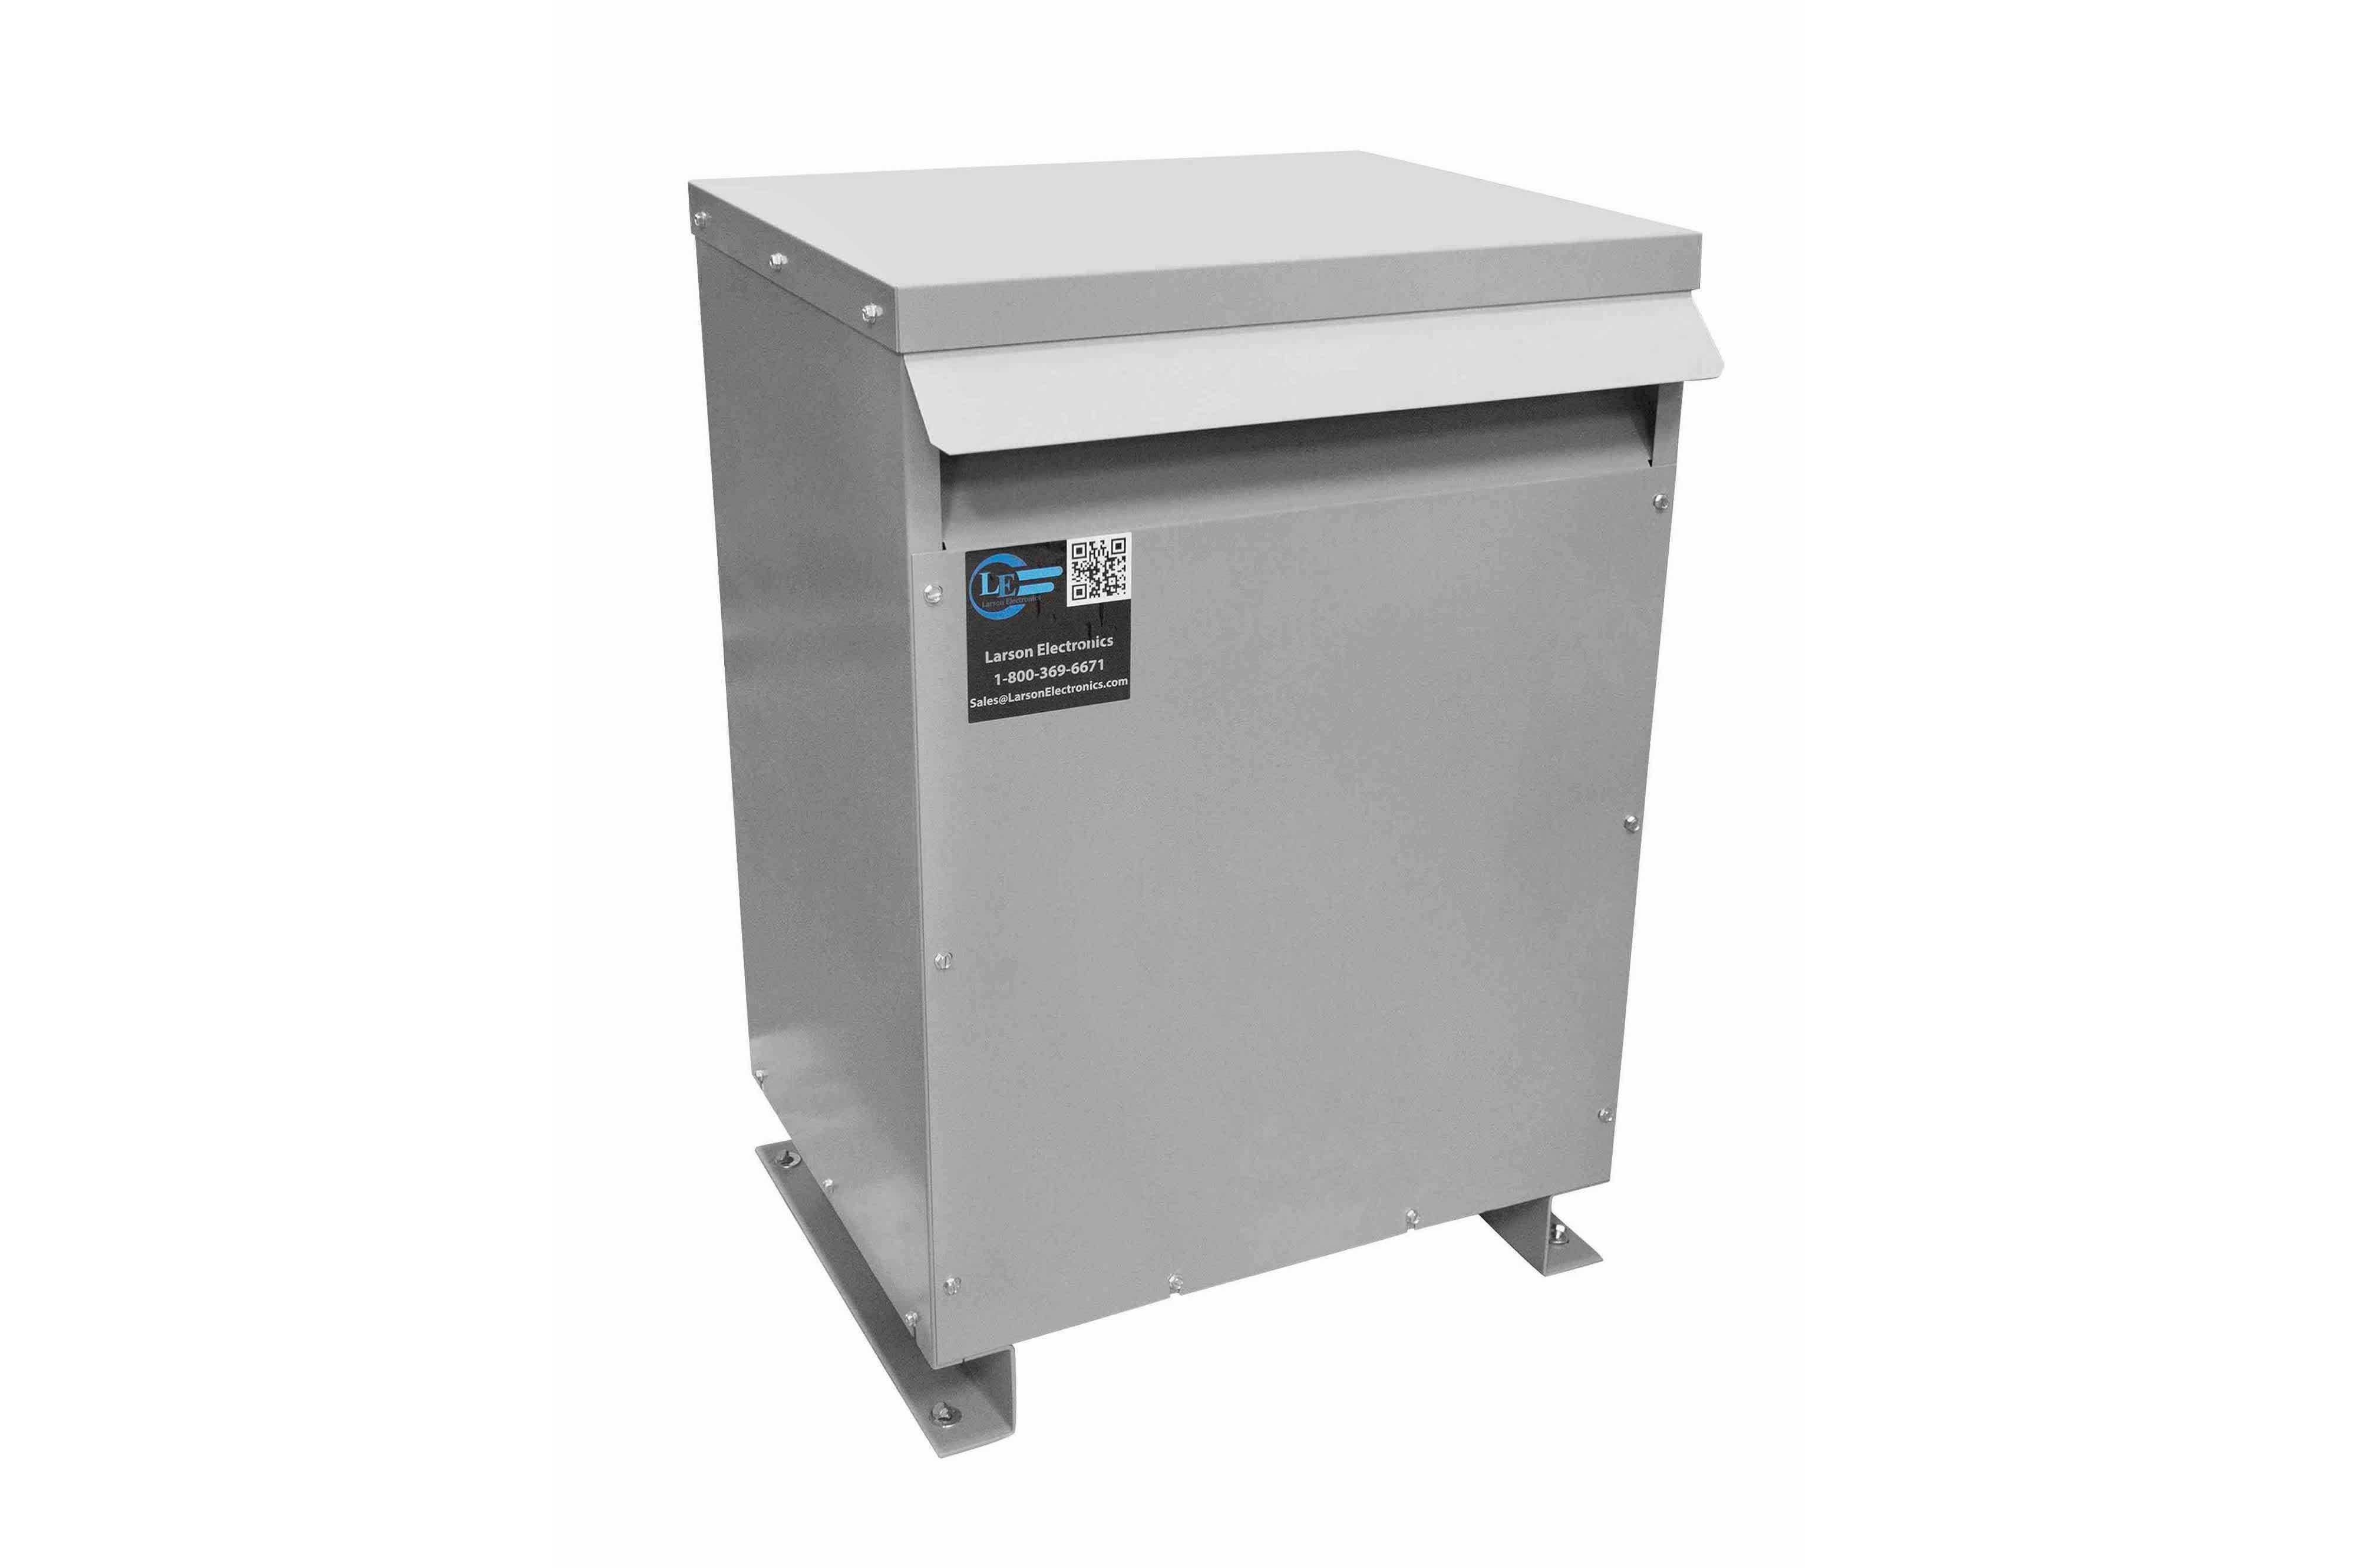 11 kVA 3PH Isolation Transformer, 600V Wye Primary, 460V Delta Secondary, N3R, Ventilated, 60 Hz